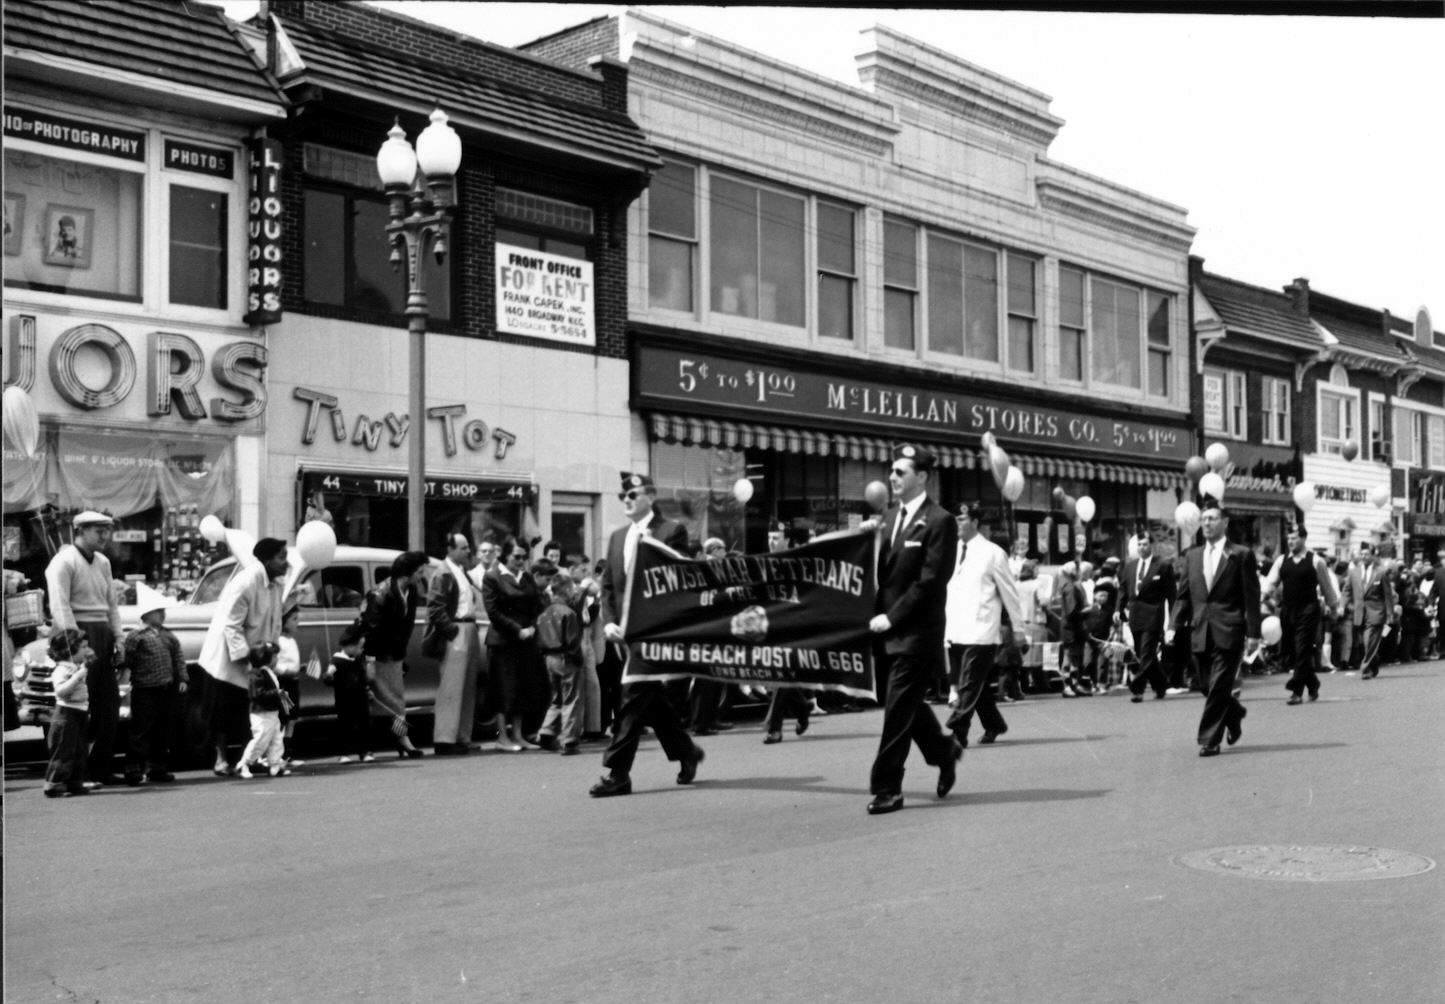 Long Beach Memorial Day Parade McLennan West Park Avenue Dr. Tydings.jpg